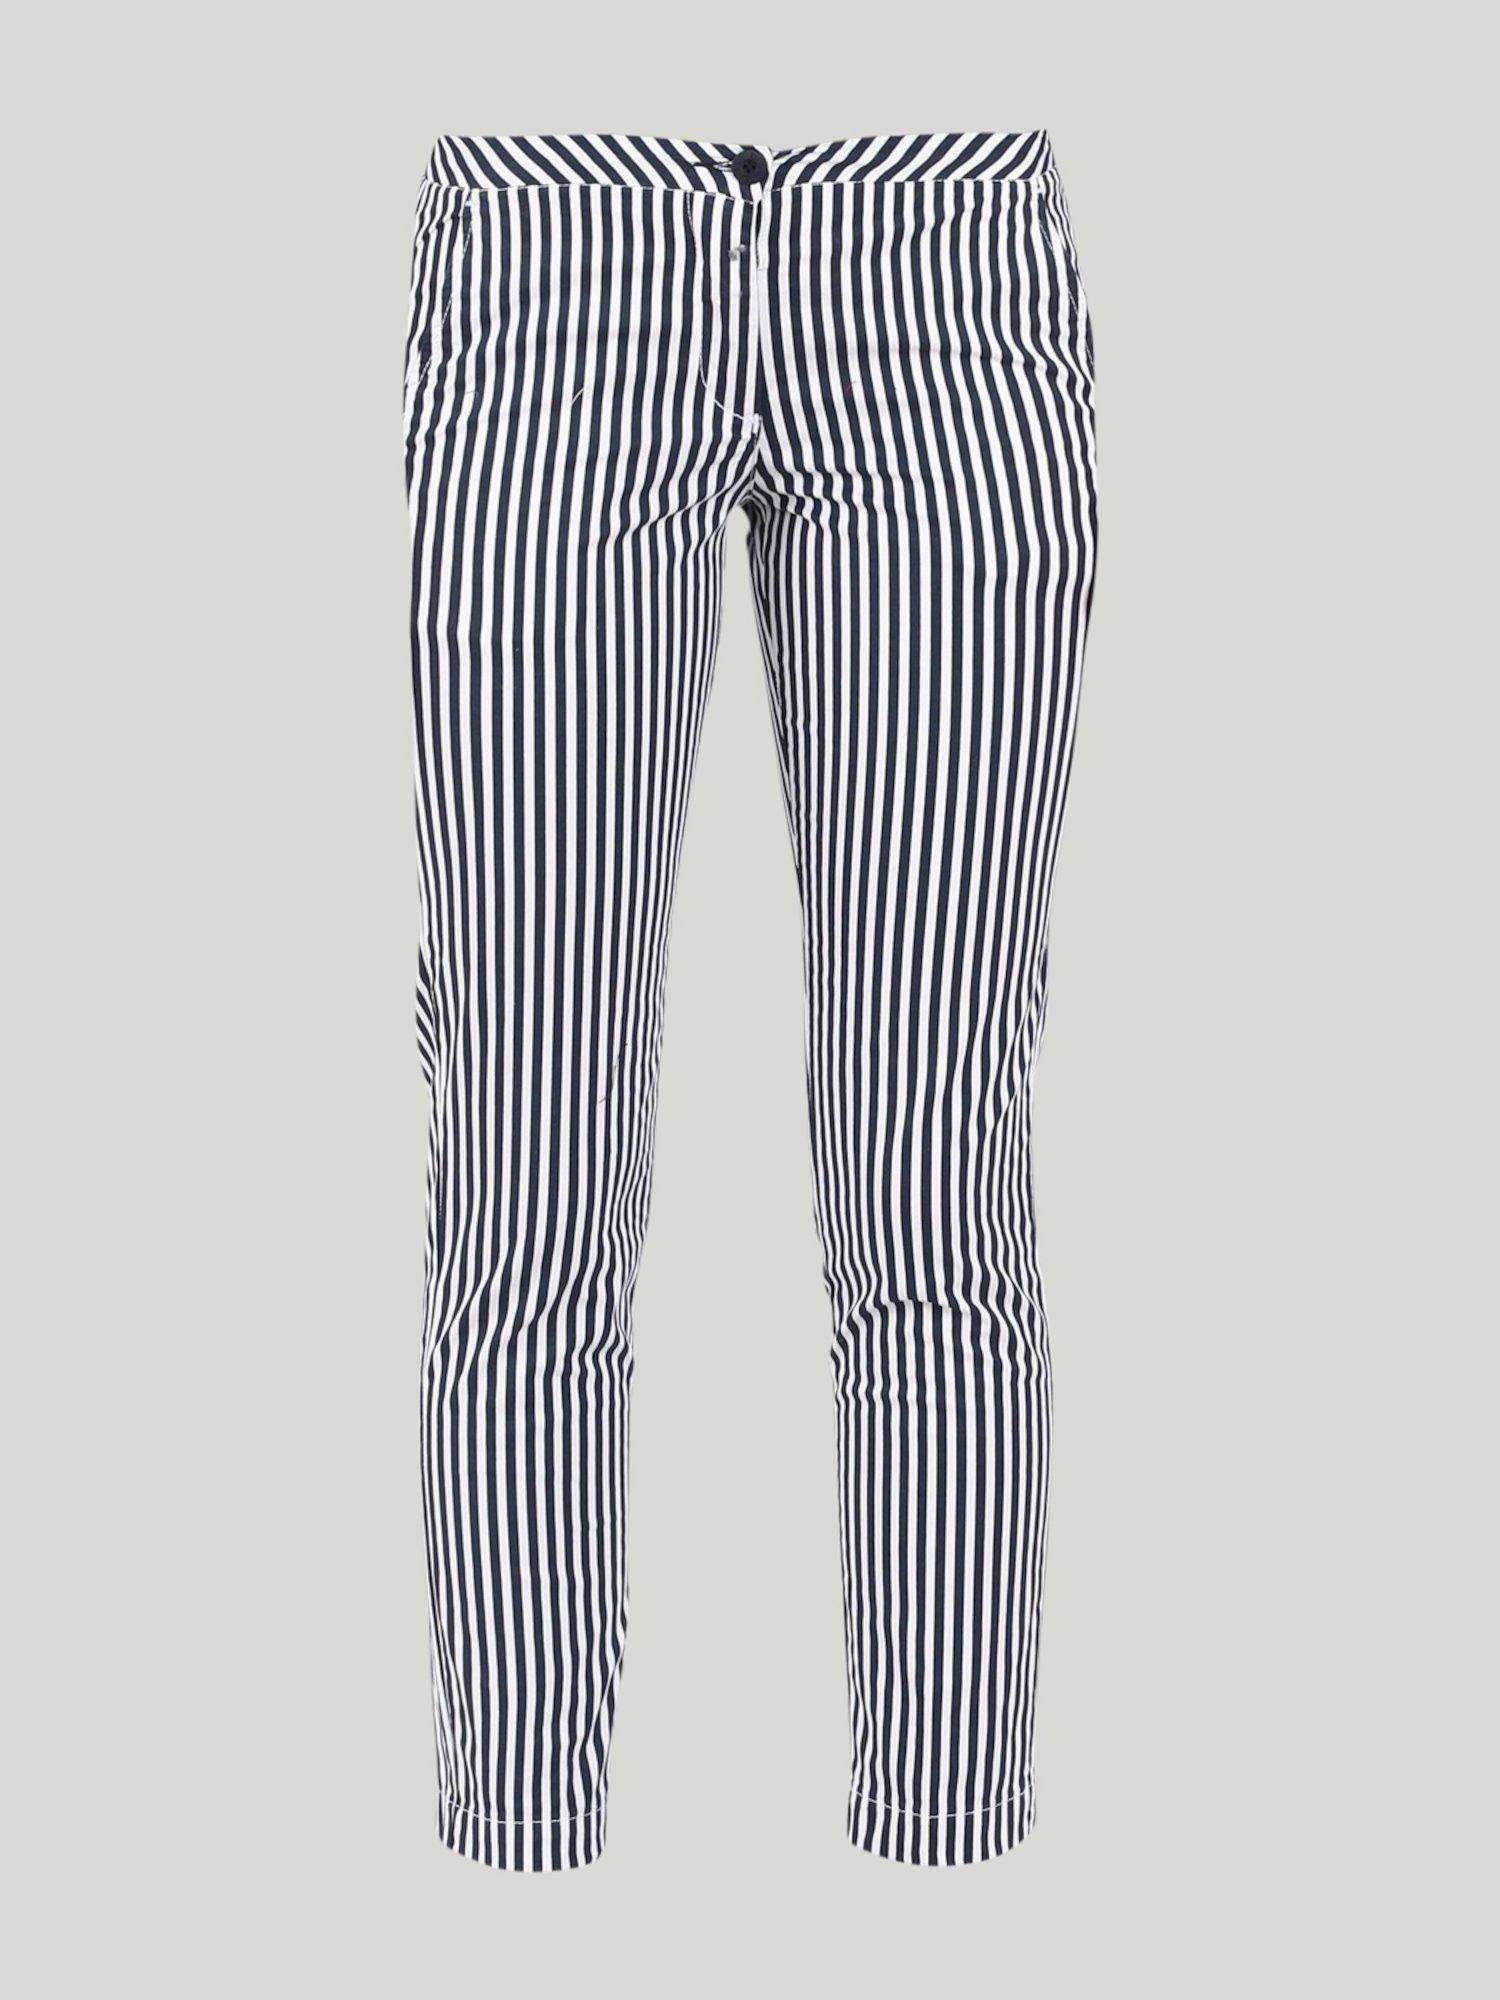 Pantalones Pineapple - White / Navy